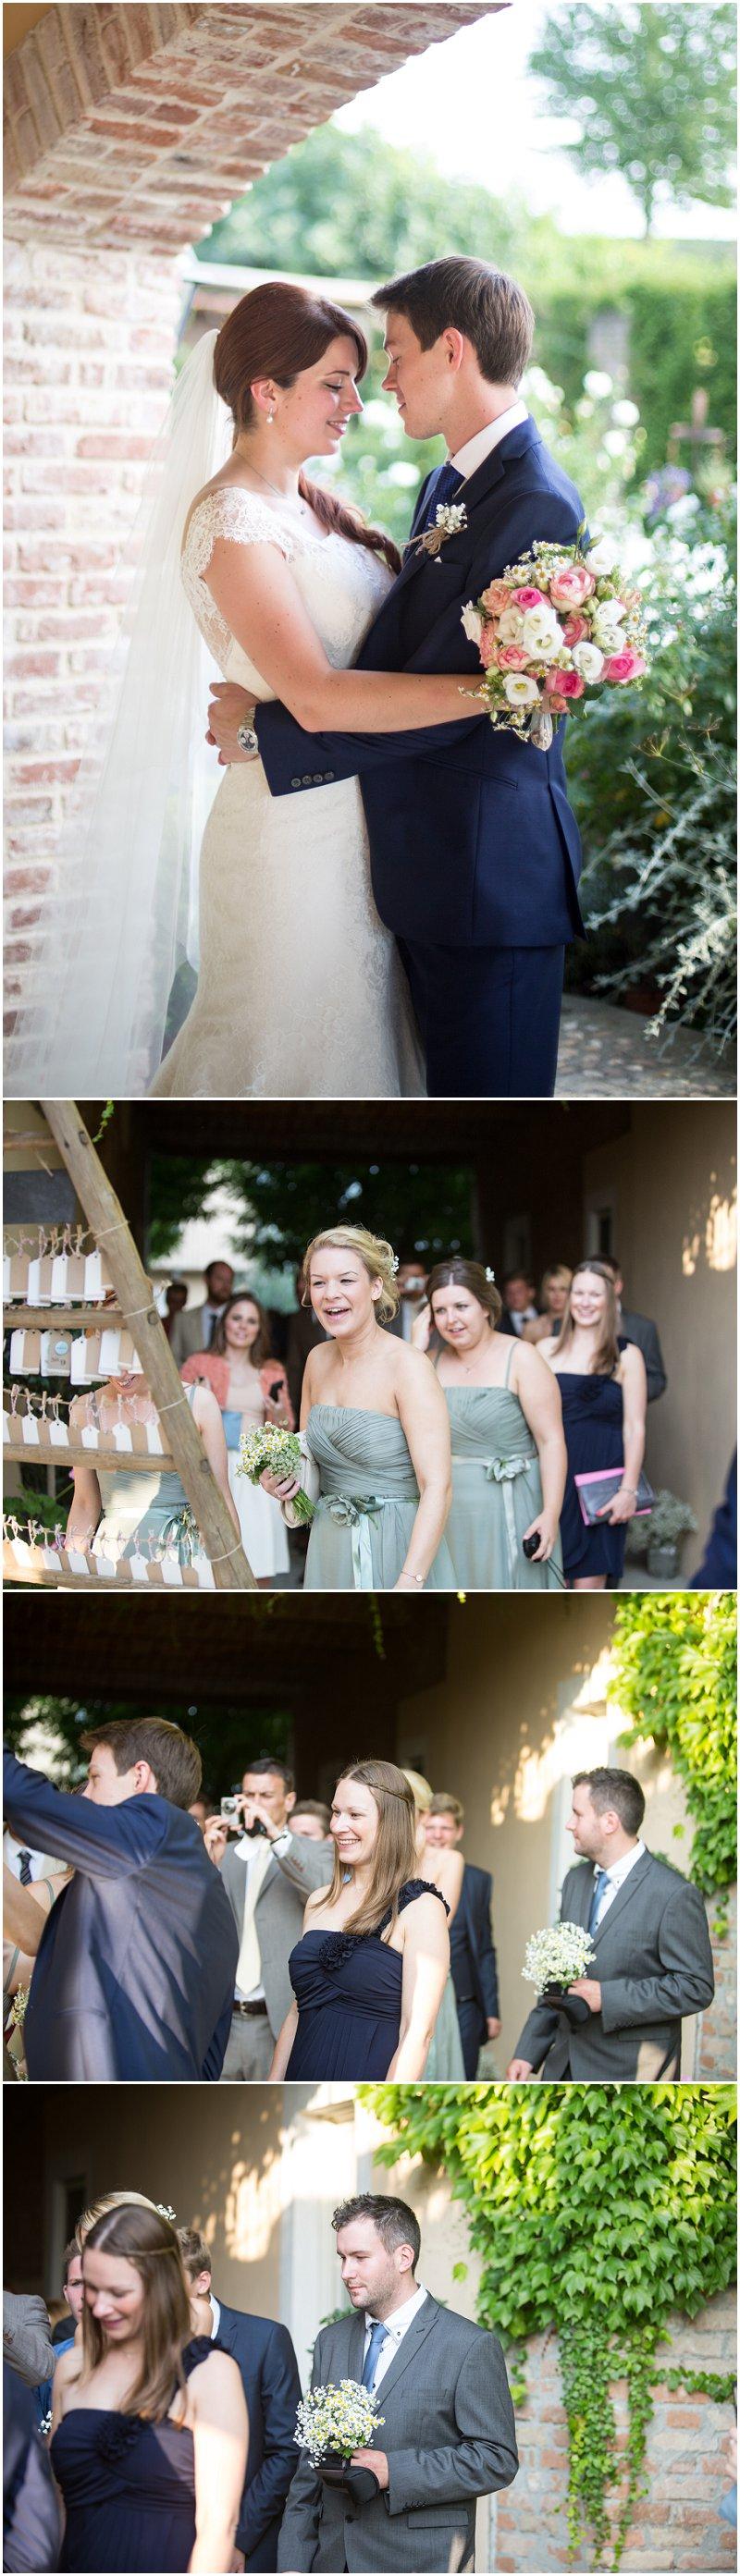 Wedding guests arrive at La Villa wedding reception